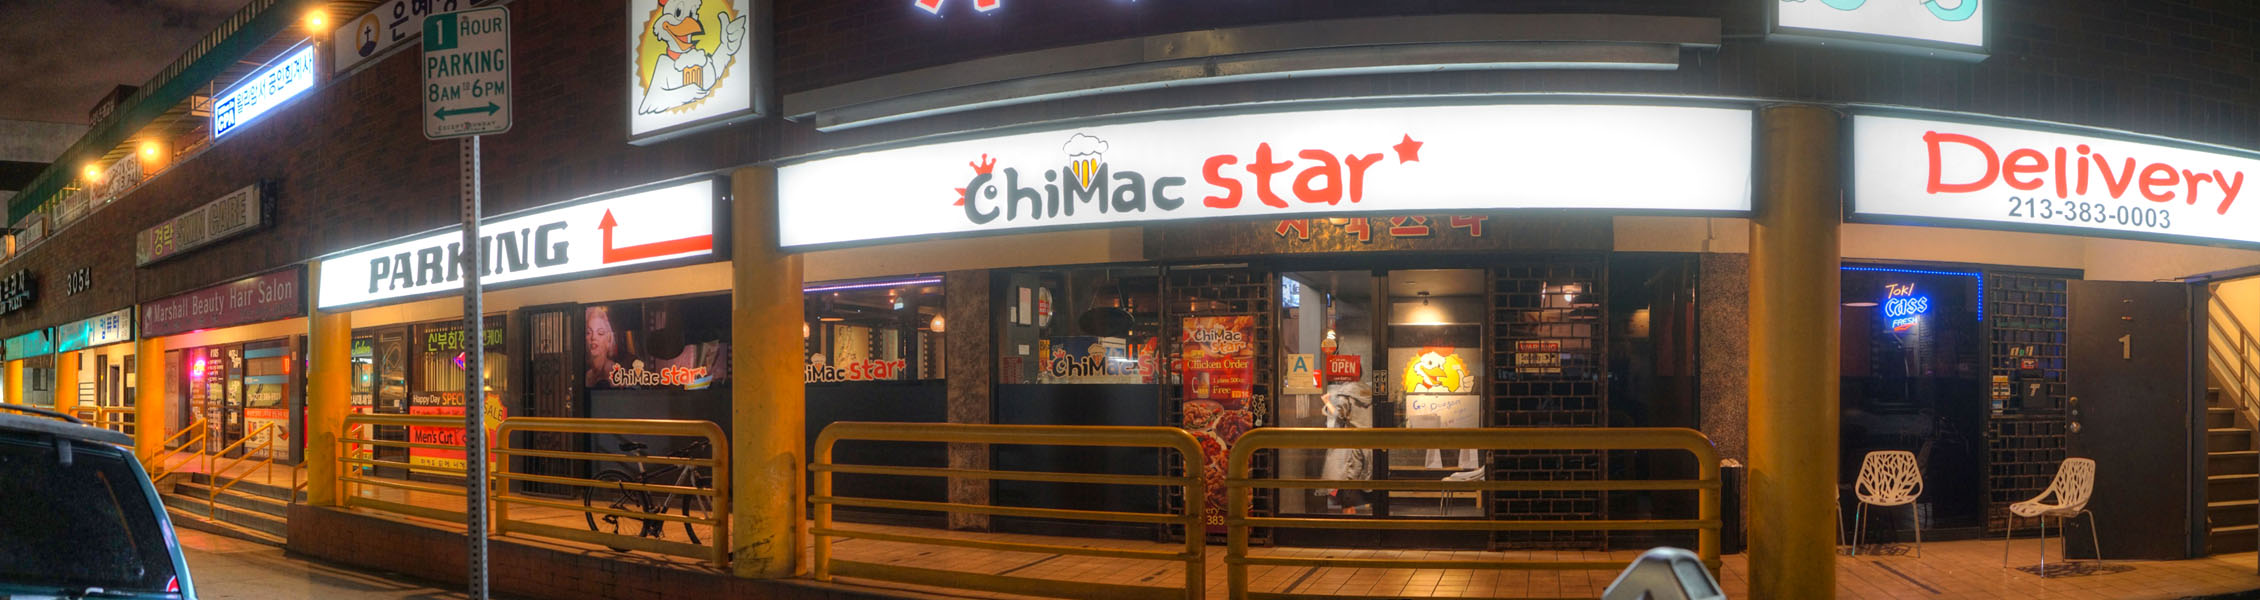 ChiMac Star Exterior